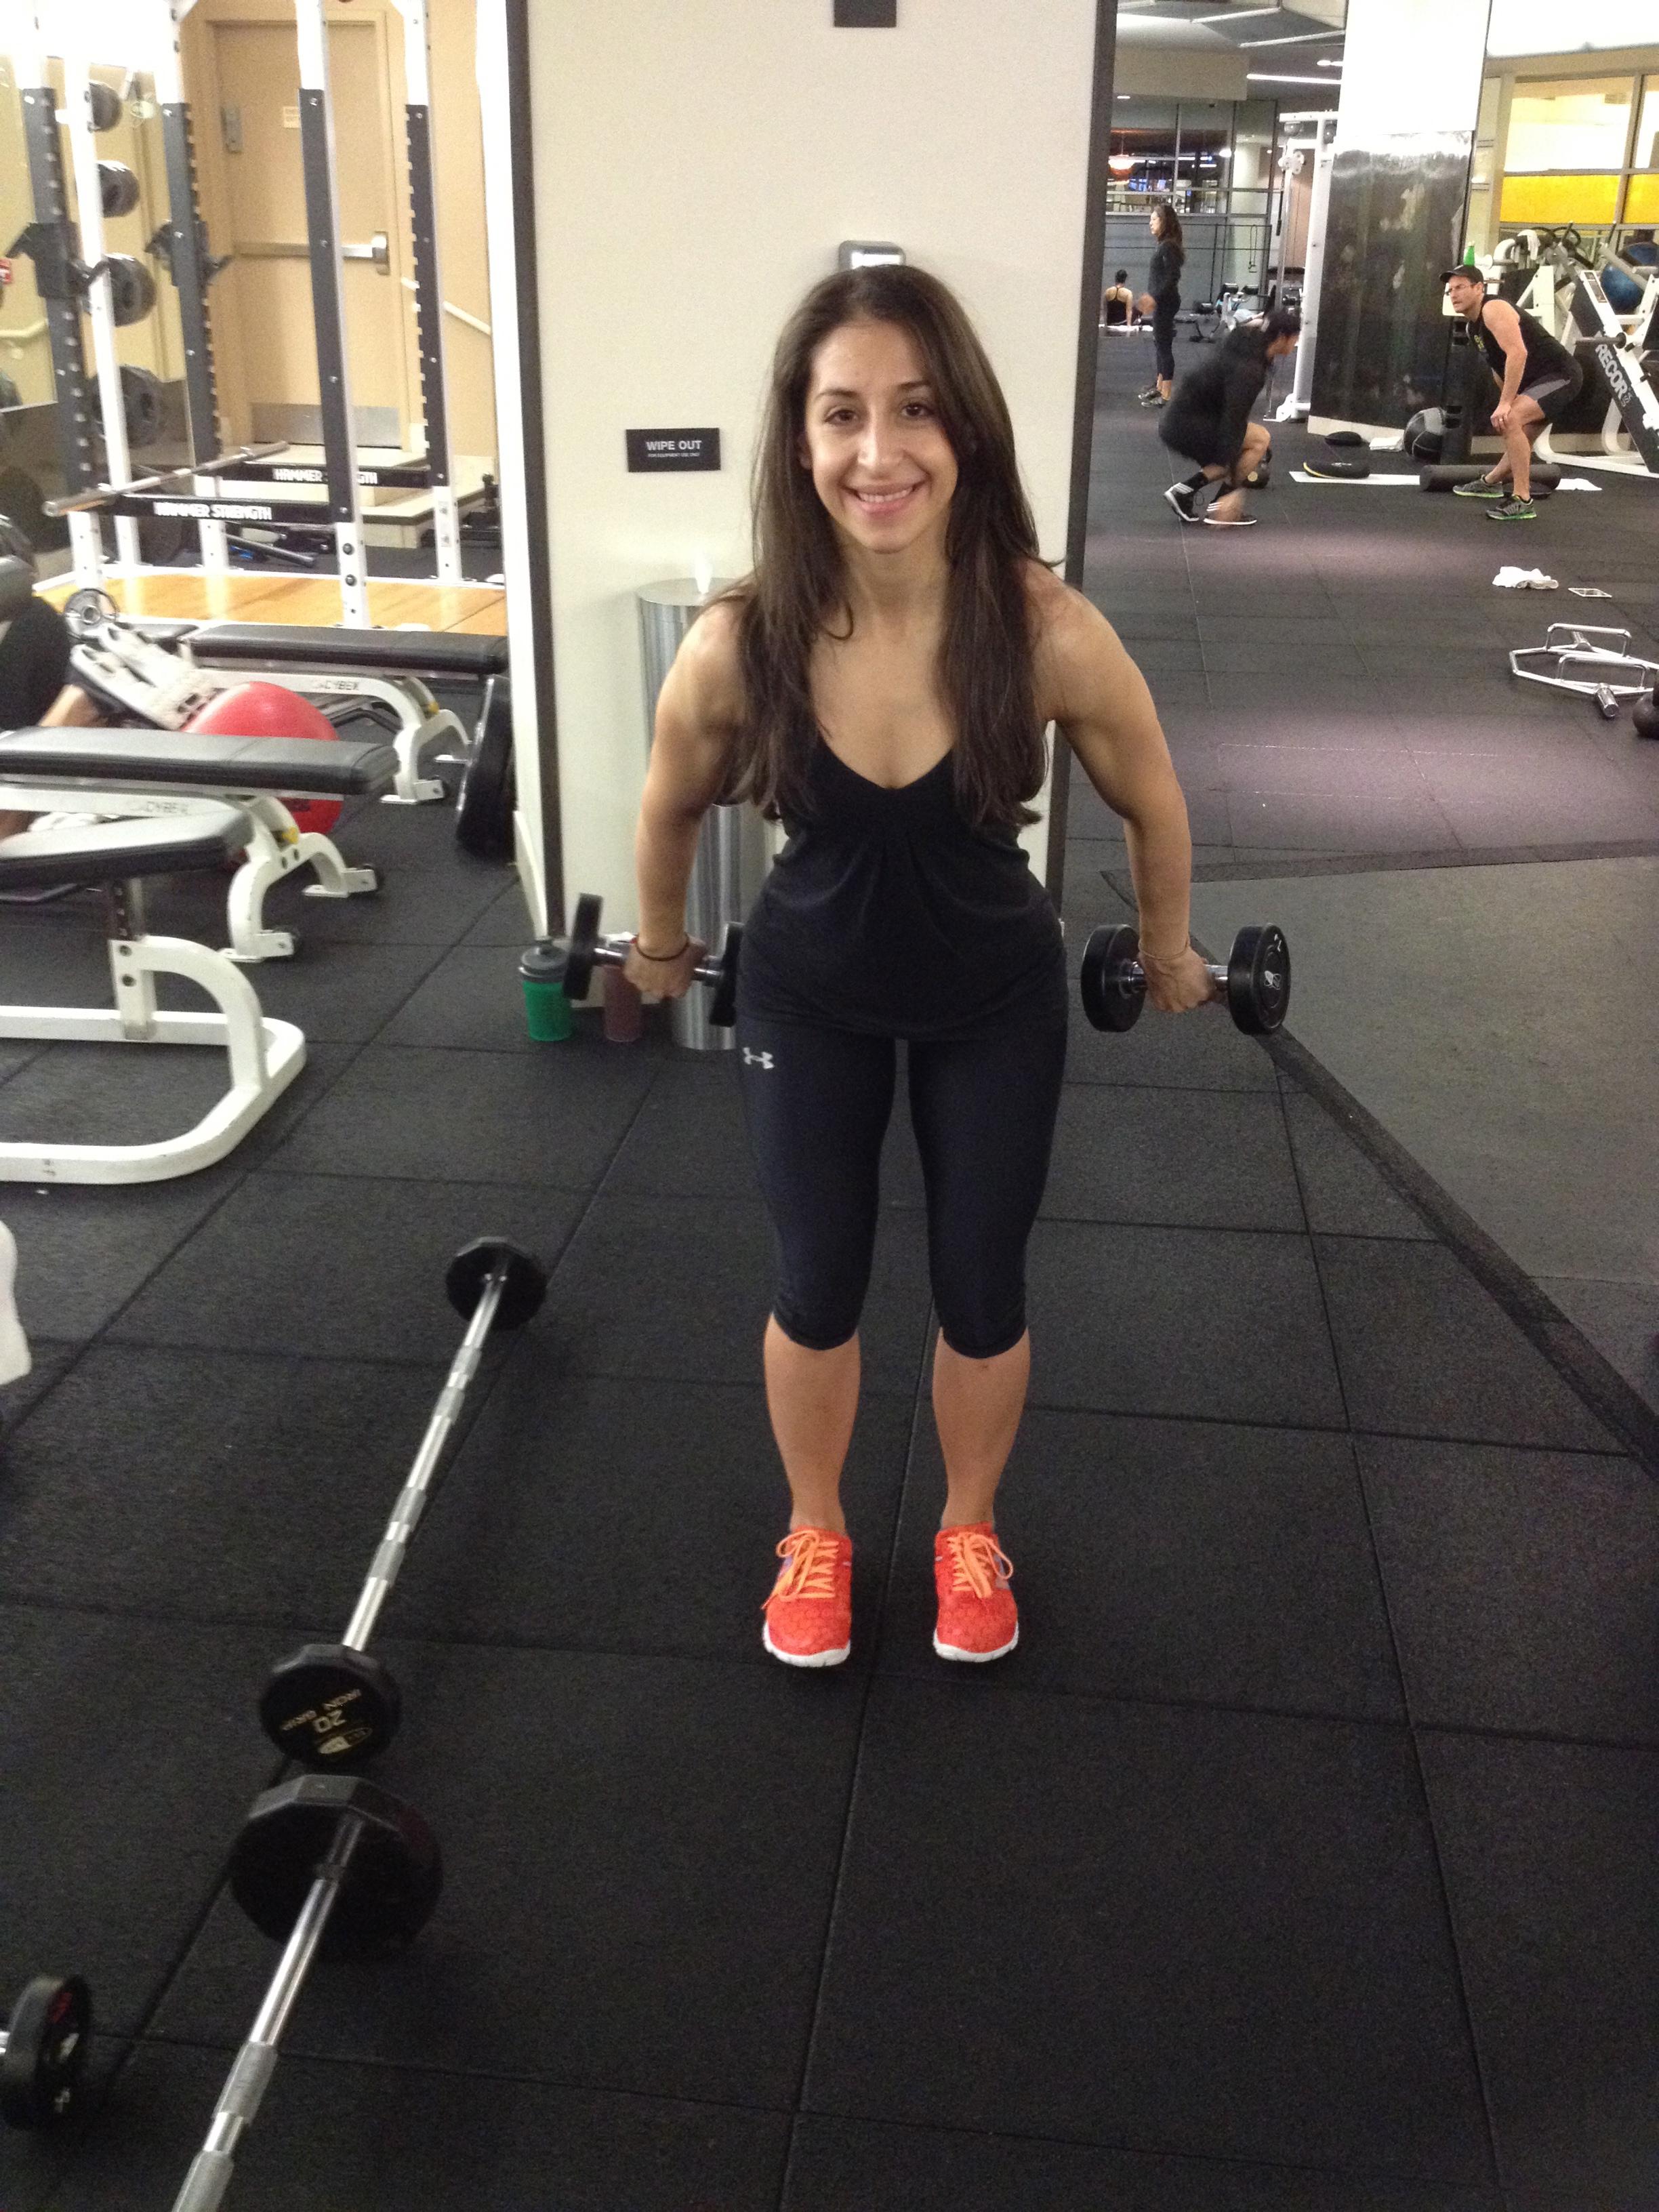 deload workout 2 shoulders steaks squats and sundresses